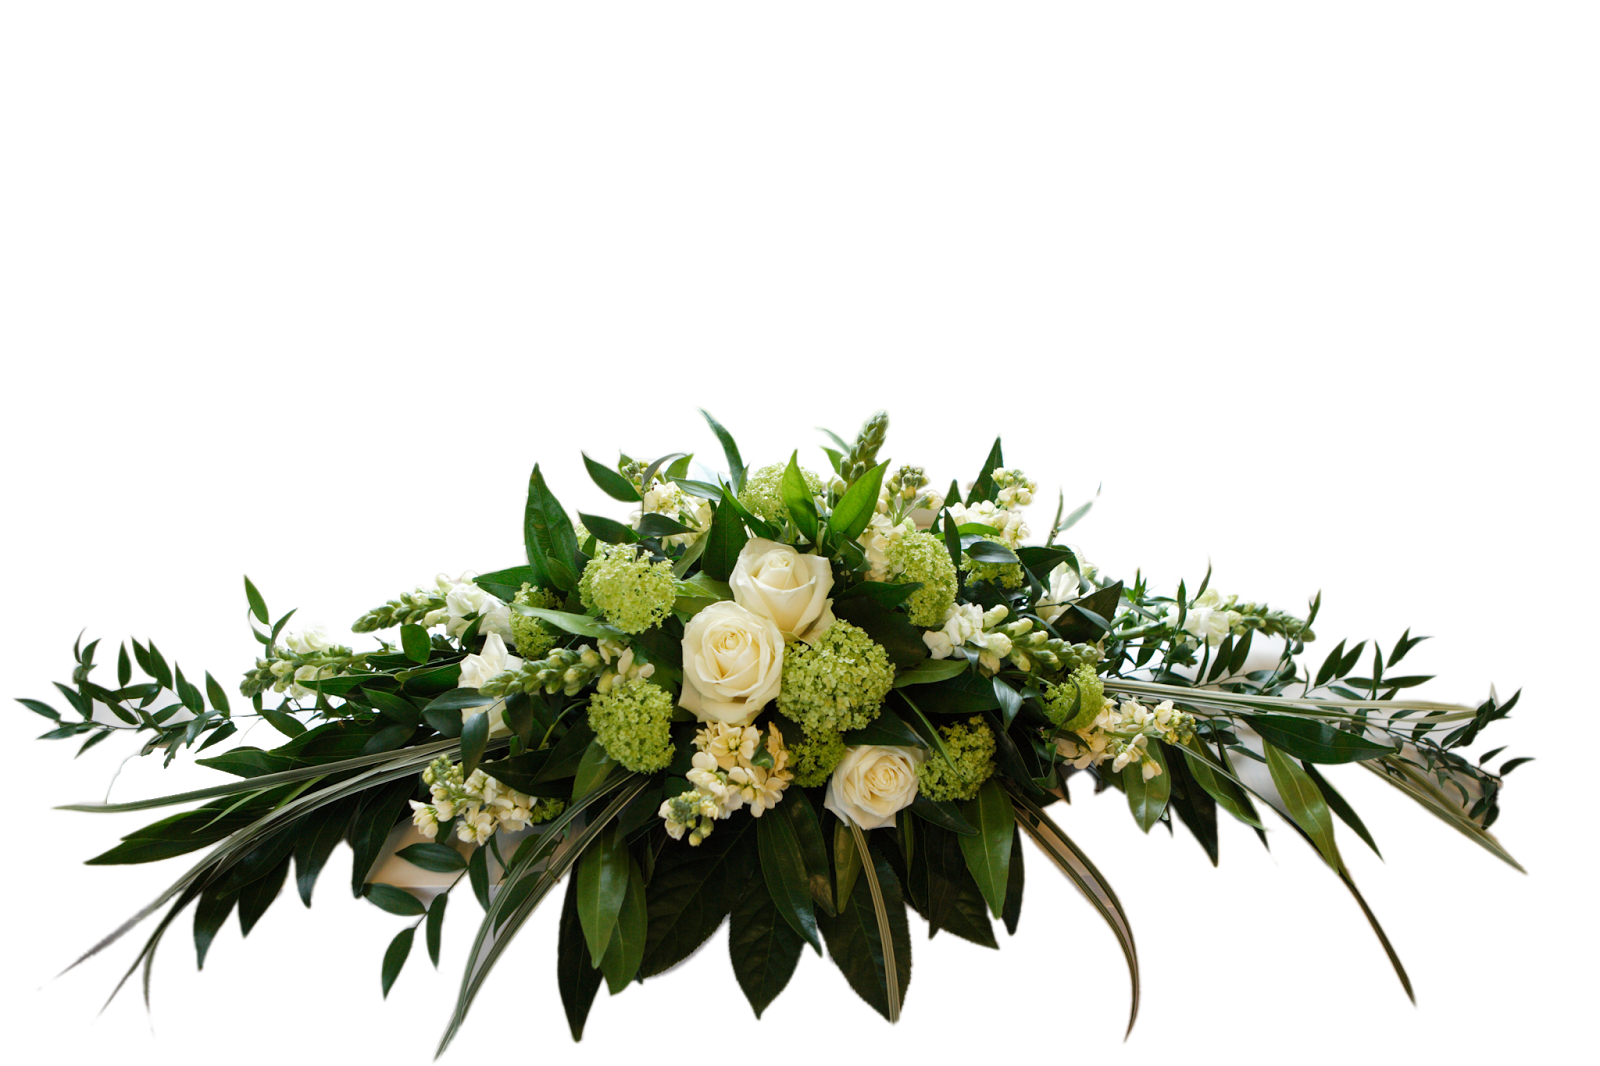 Download wedding flower image hq png image freepngimg download png image wedding flower image 440 junglespirit Choice Image